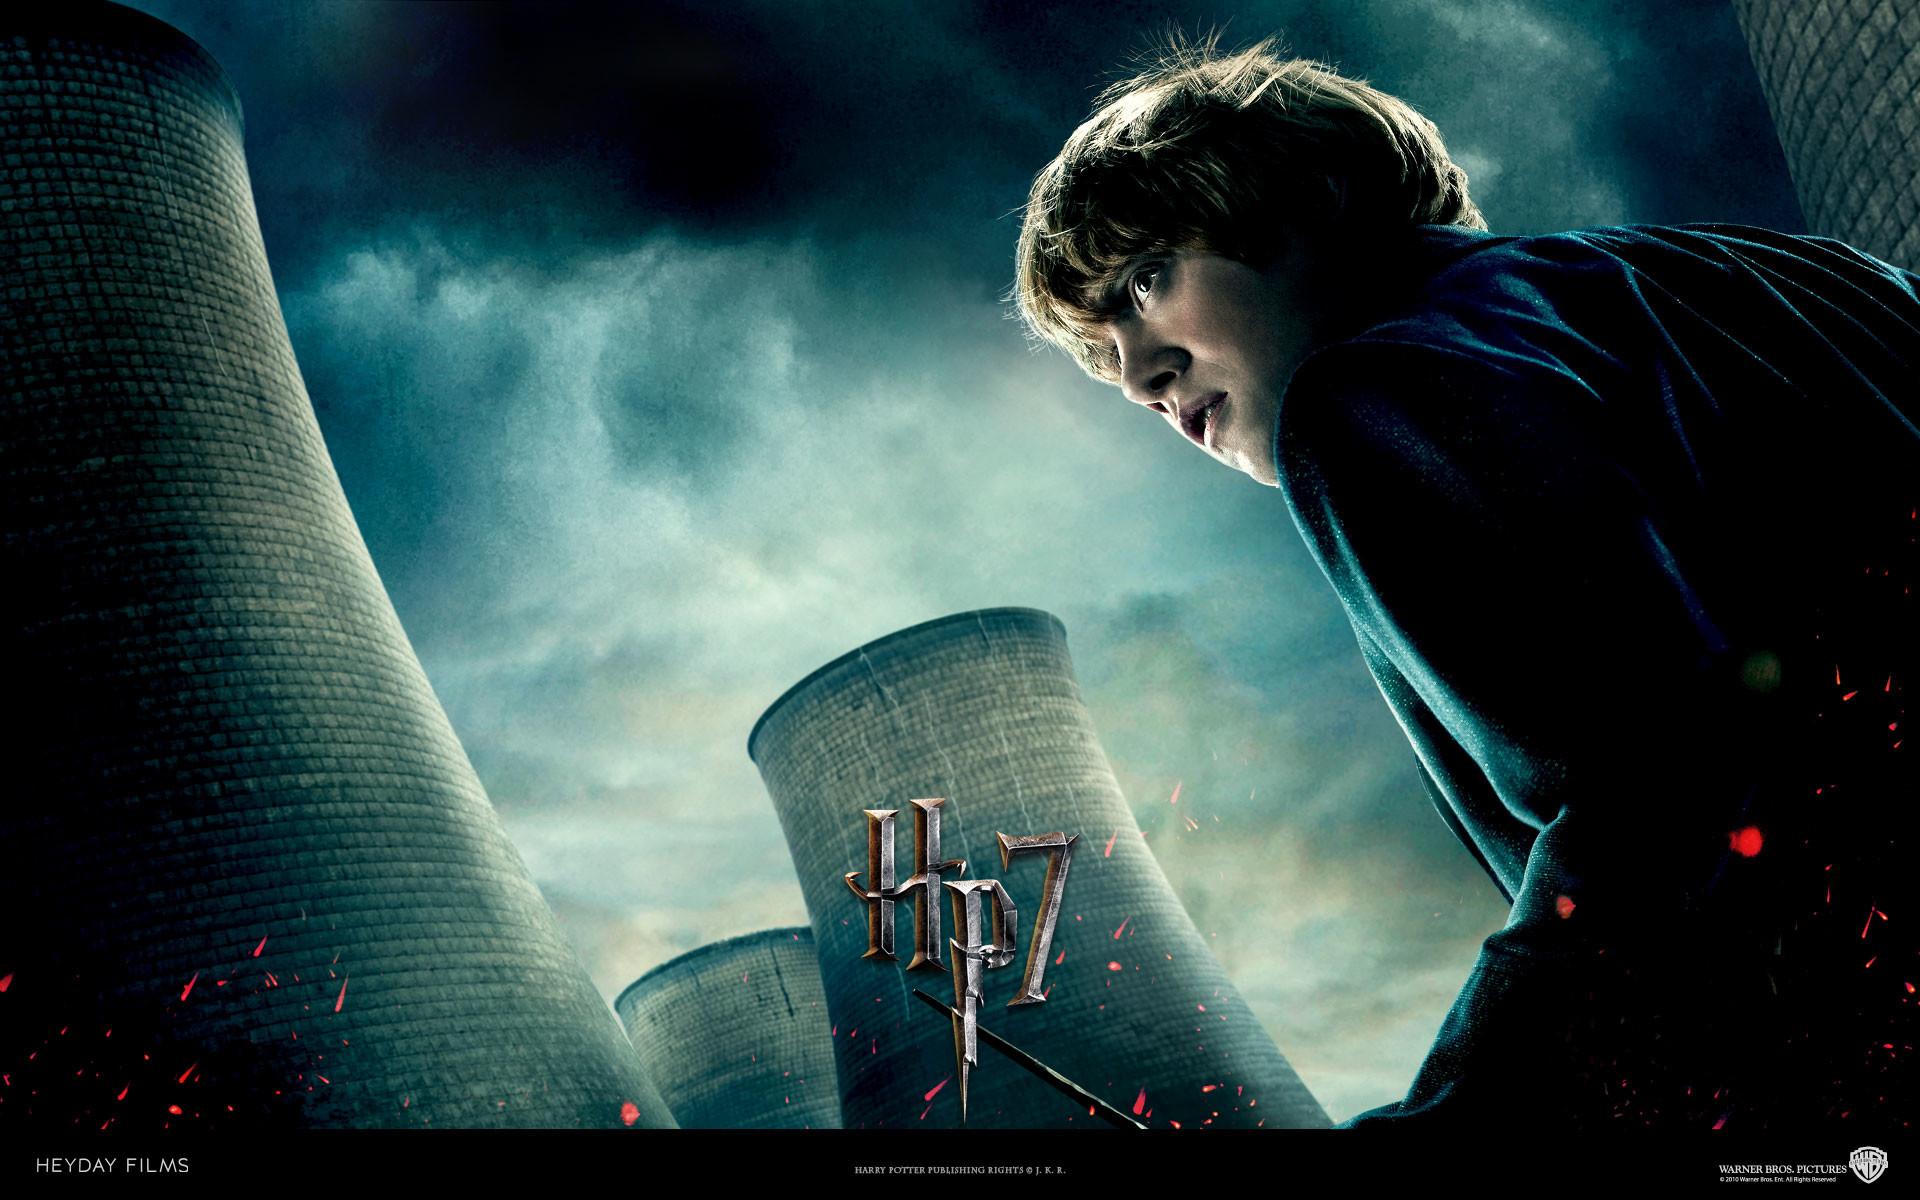 <b>Hogwarts Wallpaper Desktop Background</b> : movie <b>